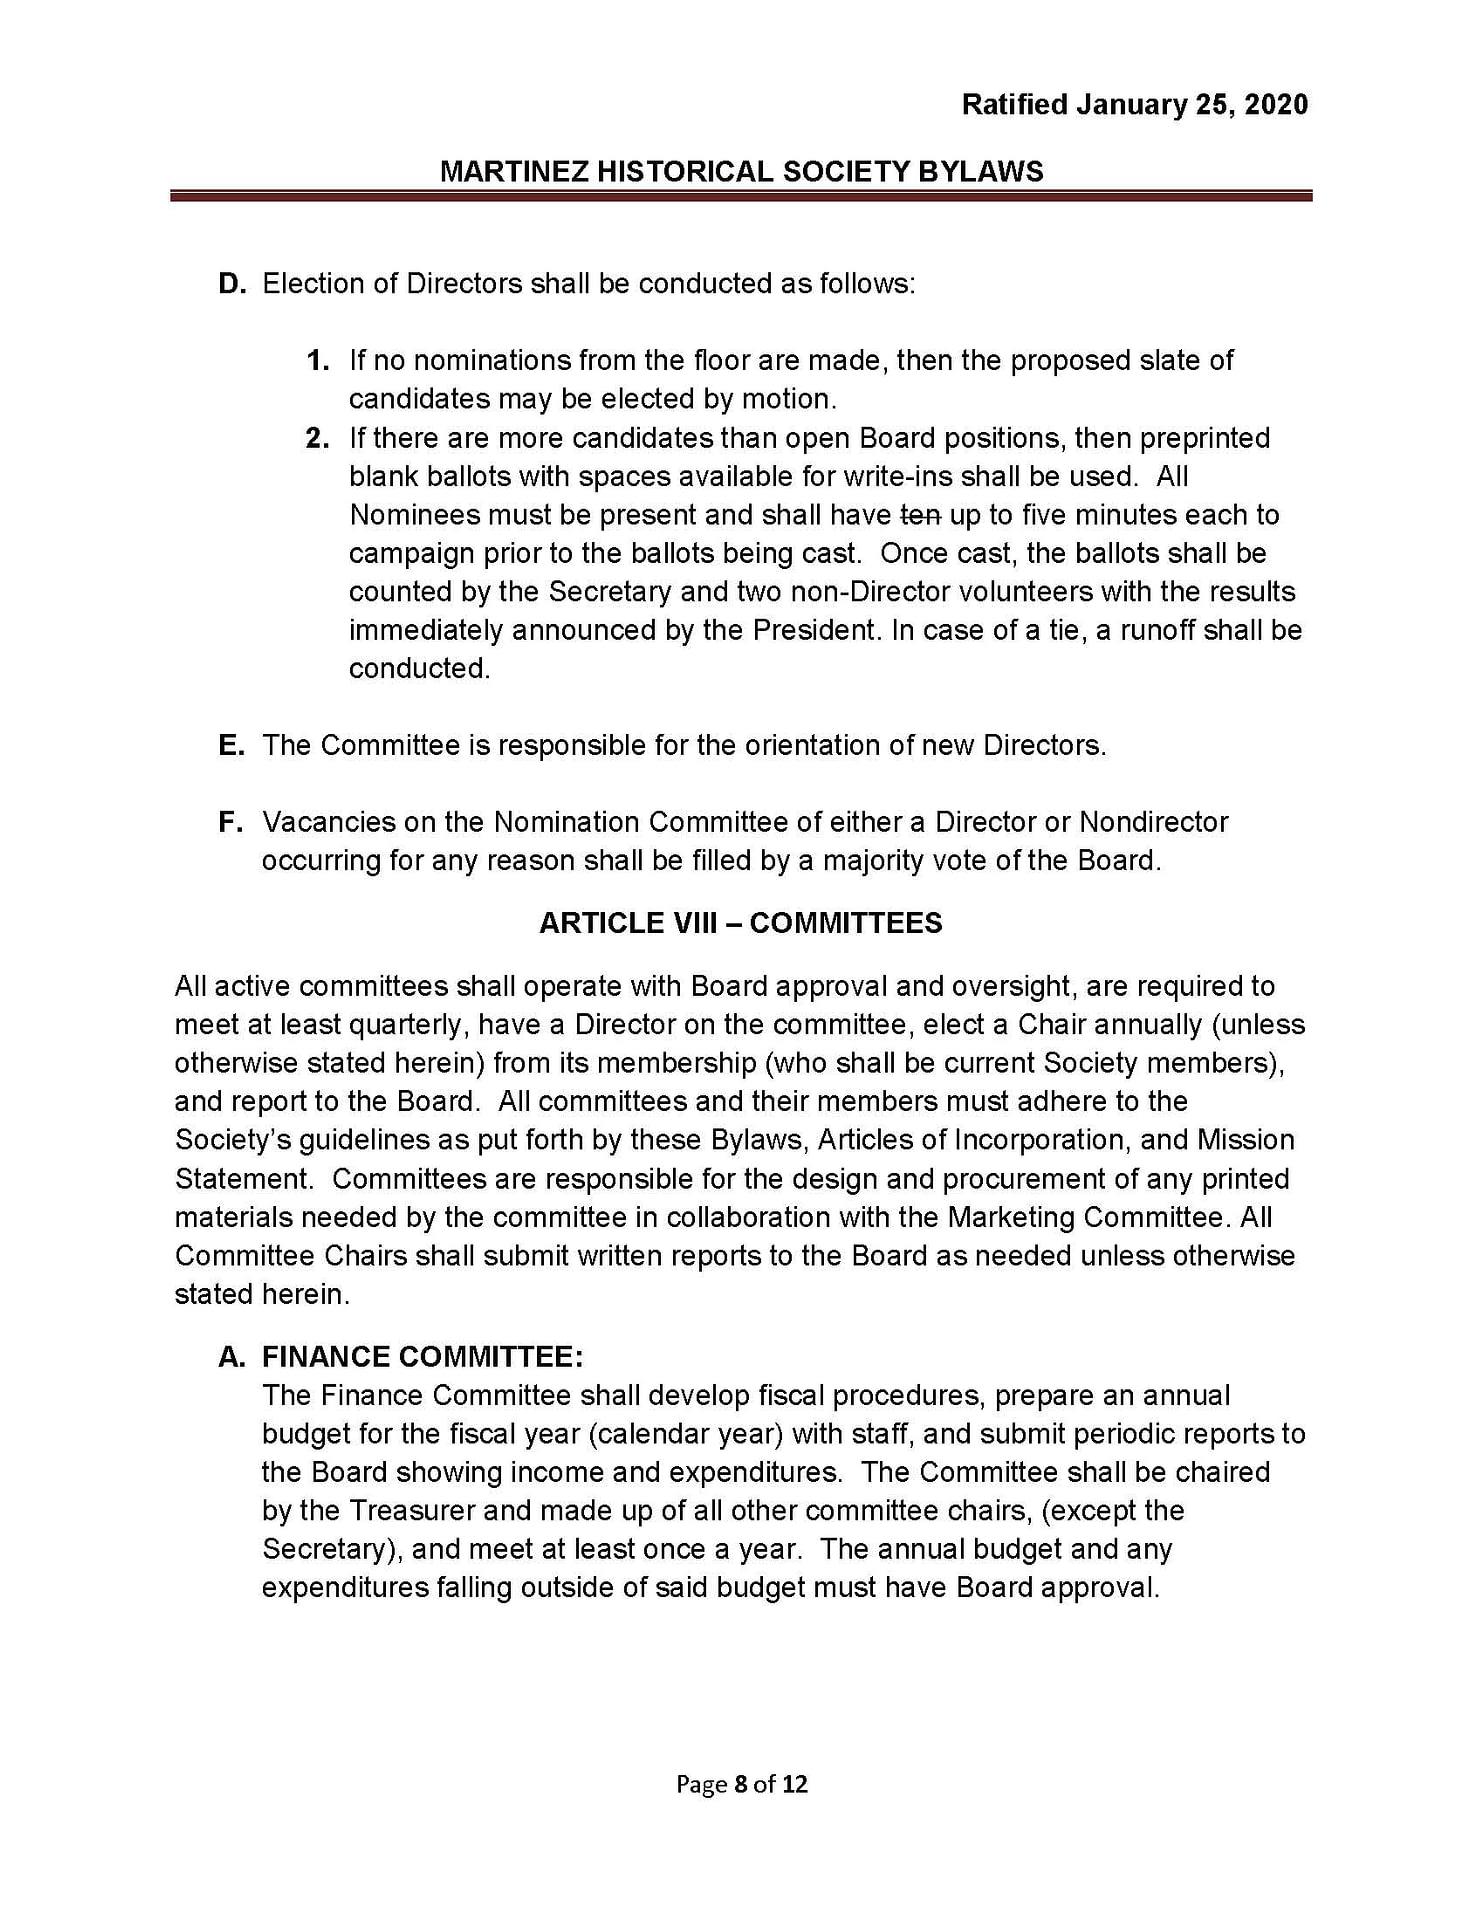 MHS Bylaws Rev 2020-01_Page_08